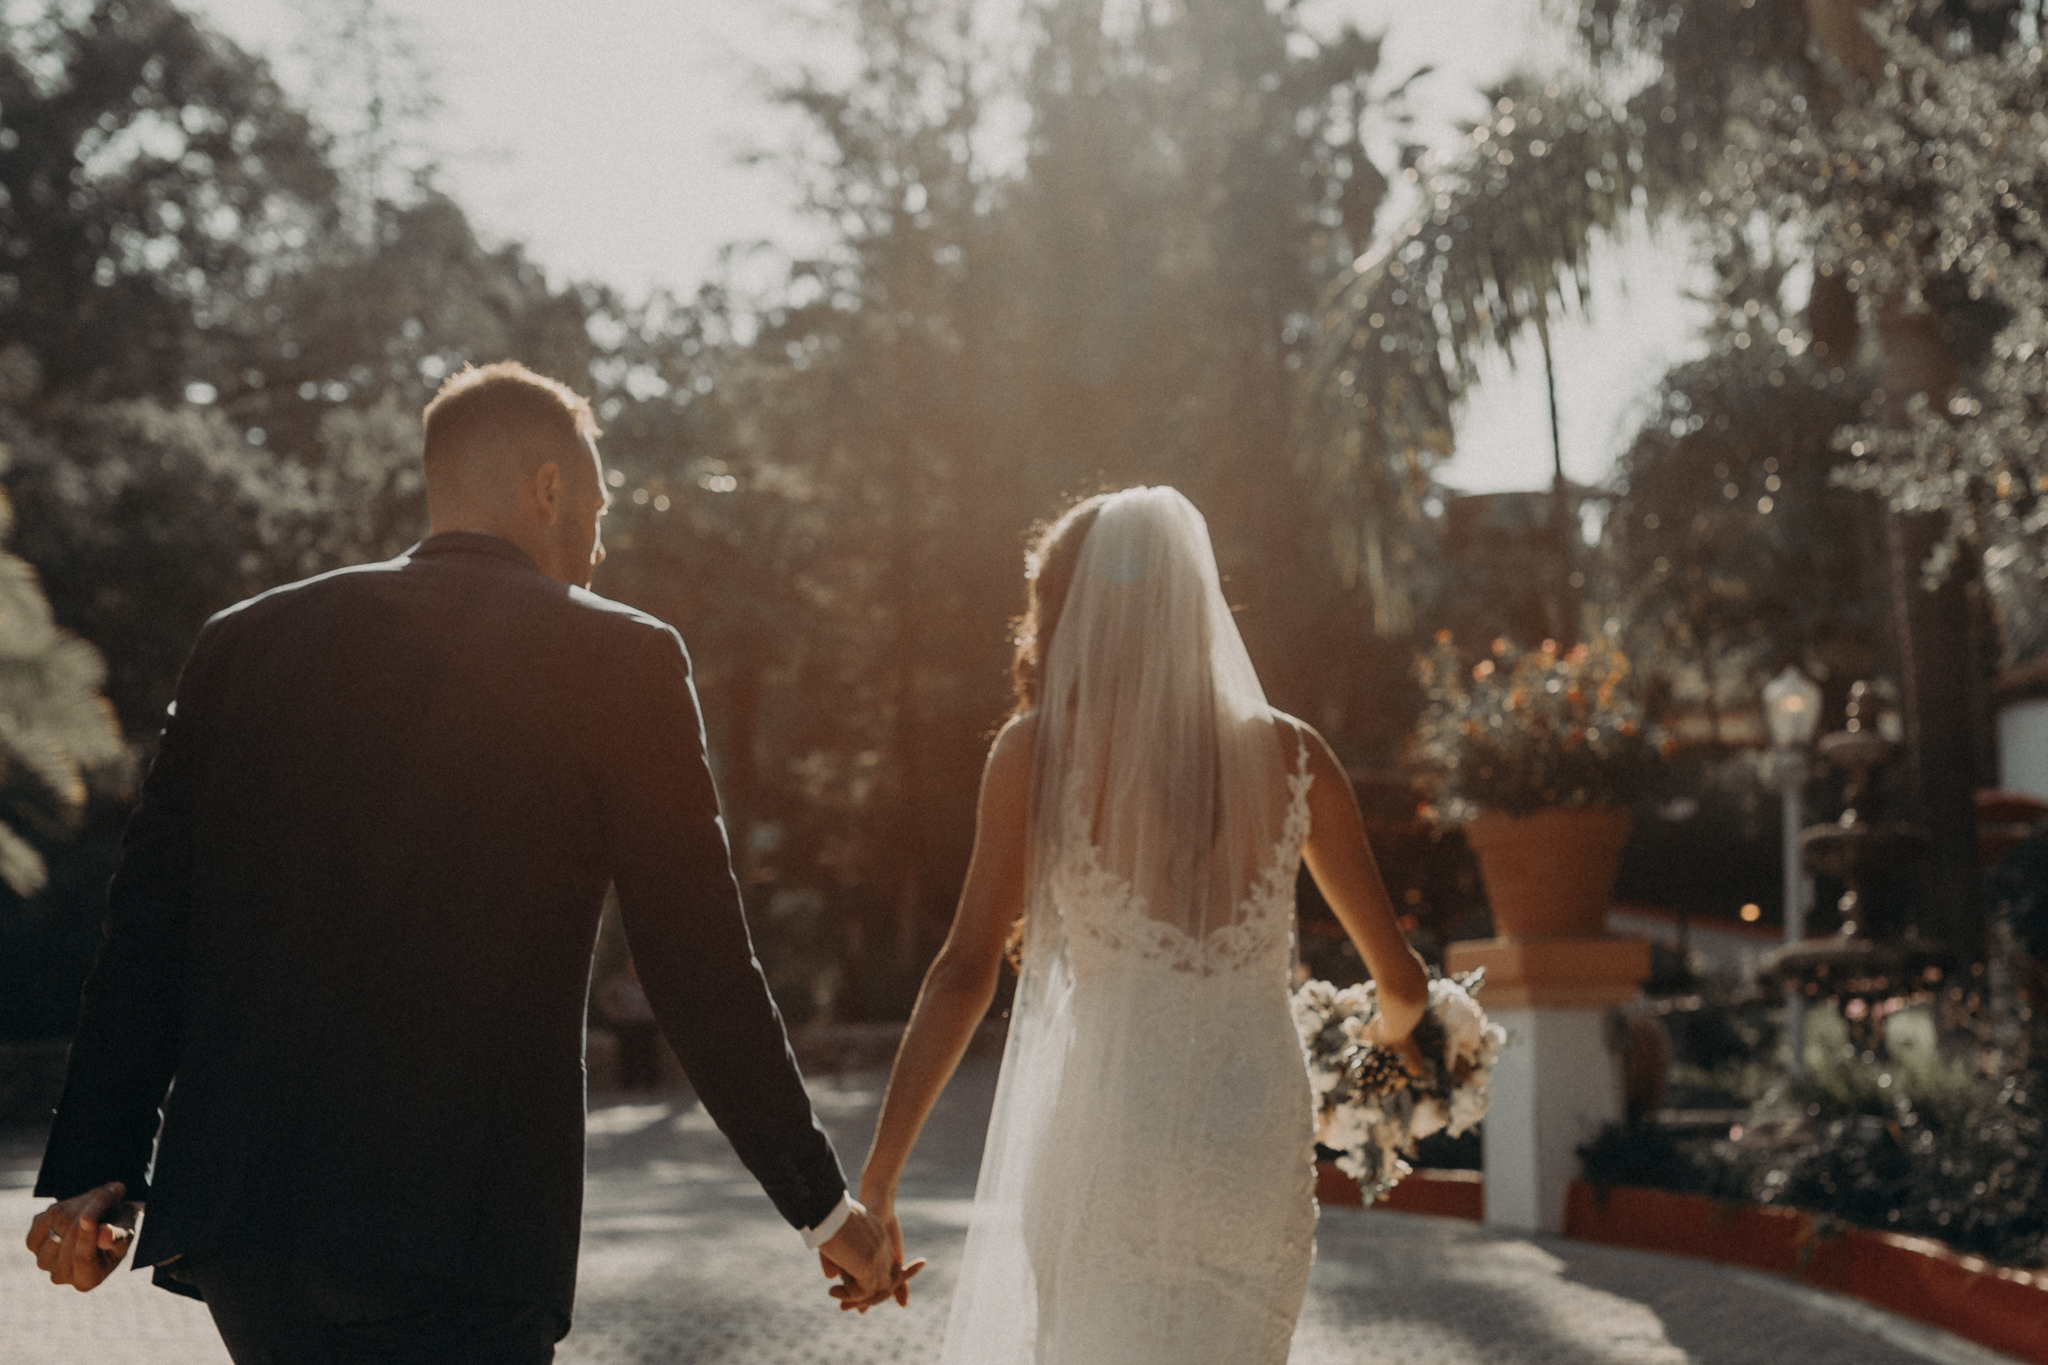 Isaiah + Taylor Photography - Rancho Las Lomas Wedding, Los Angeles Wedding Photographer-084.jpg